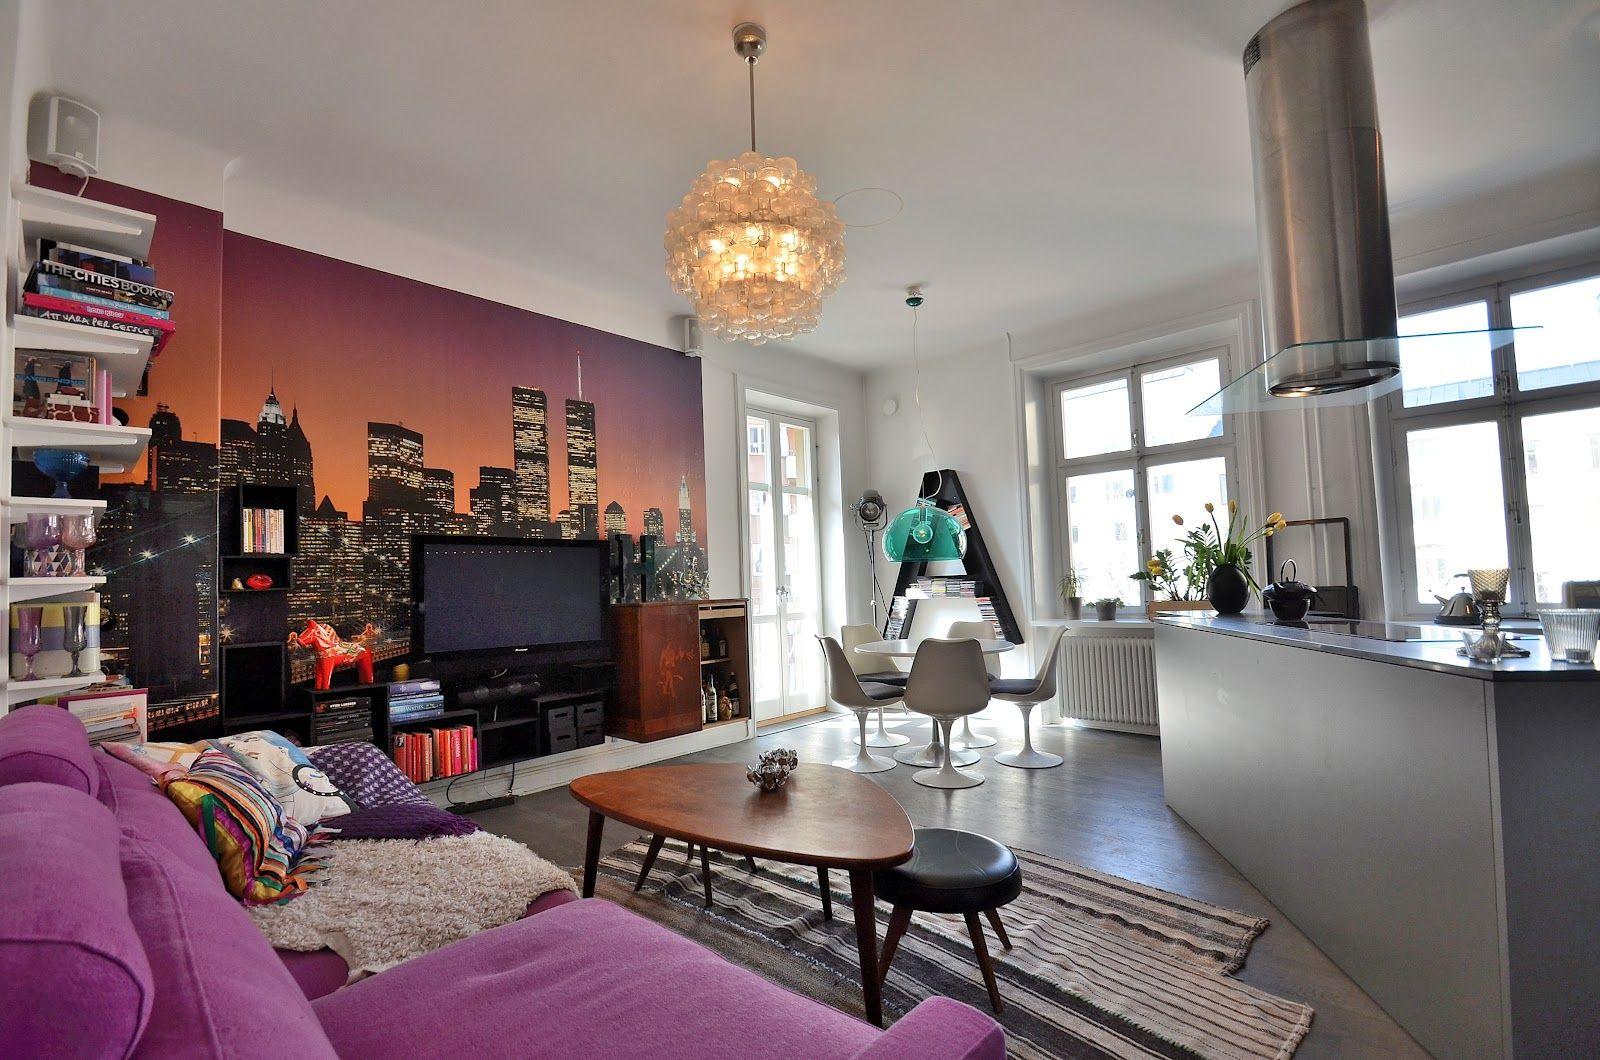 Cool Apartment Decor - Home Decorating Ideas